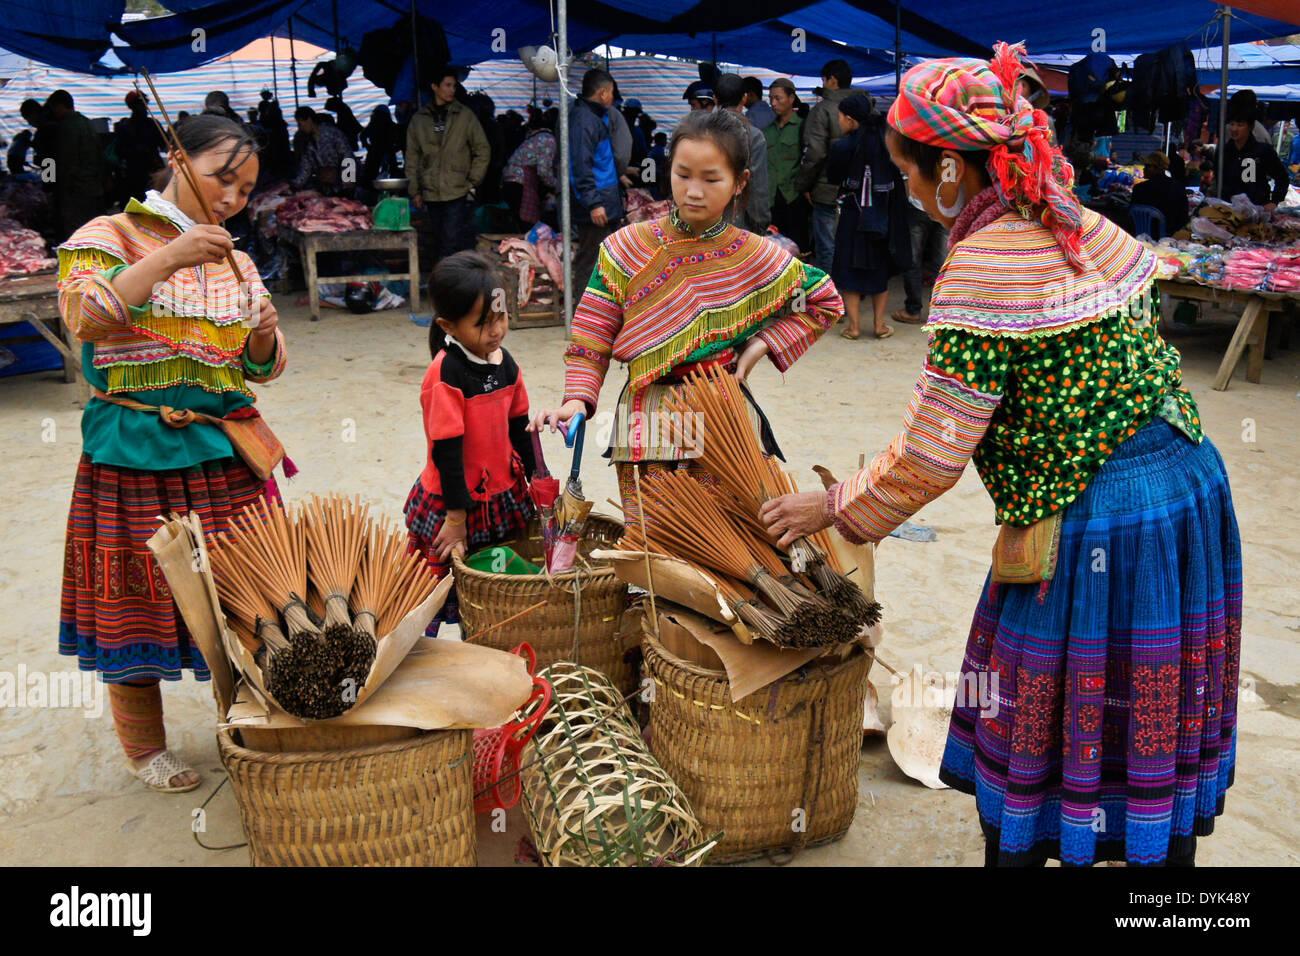 Flower Hmong women and children selling incense at Sunday market, Bac Ha, Sapa (Sa Pa), North Vietnam - Stock Image